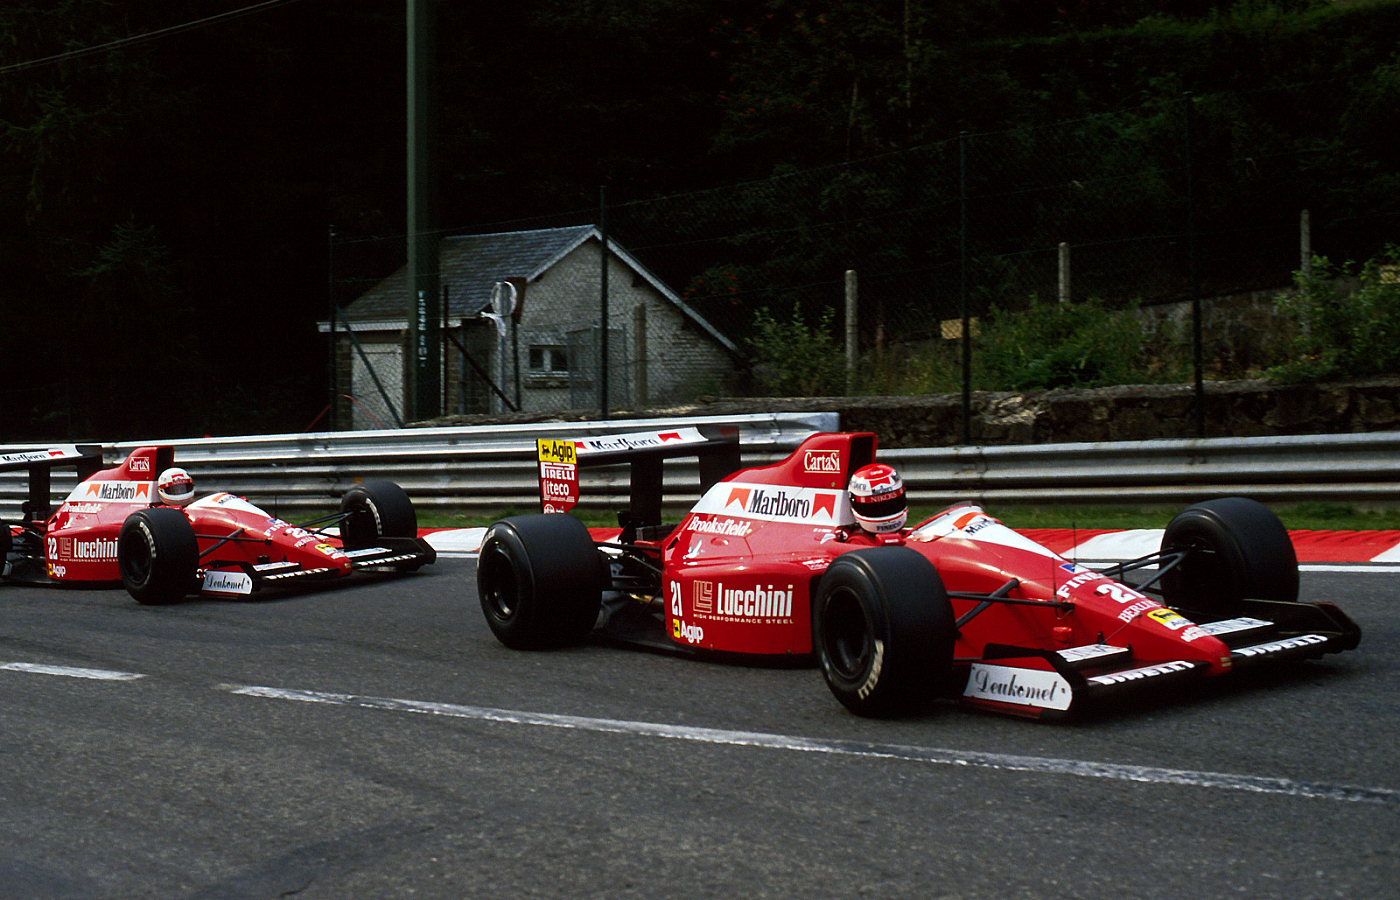 Dallara f1 1992 - foto by Bandeira Verde